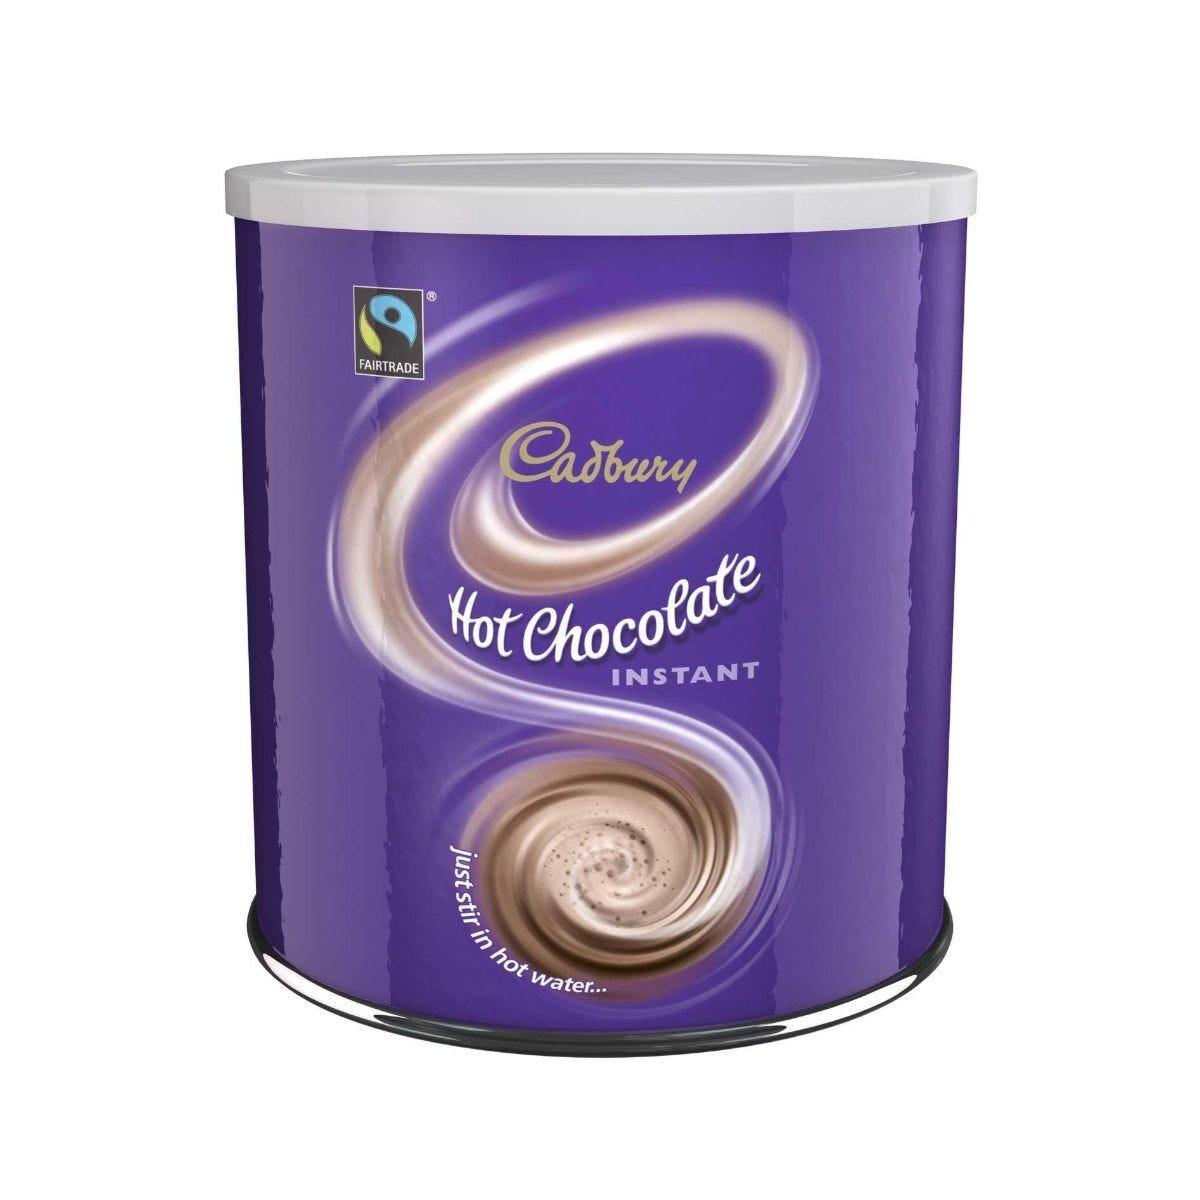 Cadbury Instant Hot Chocolate 2000g